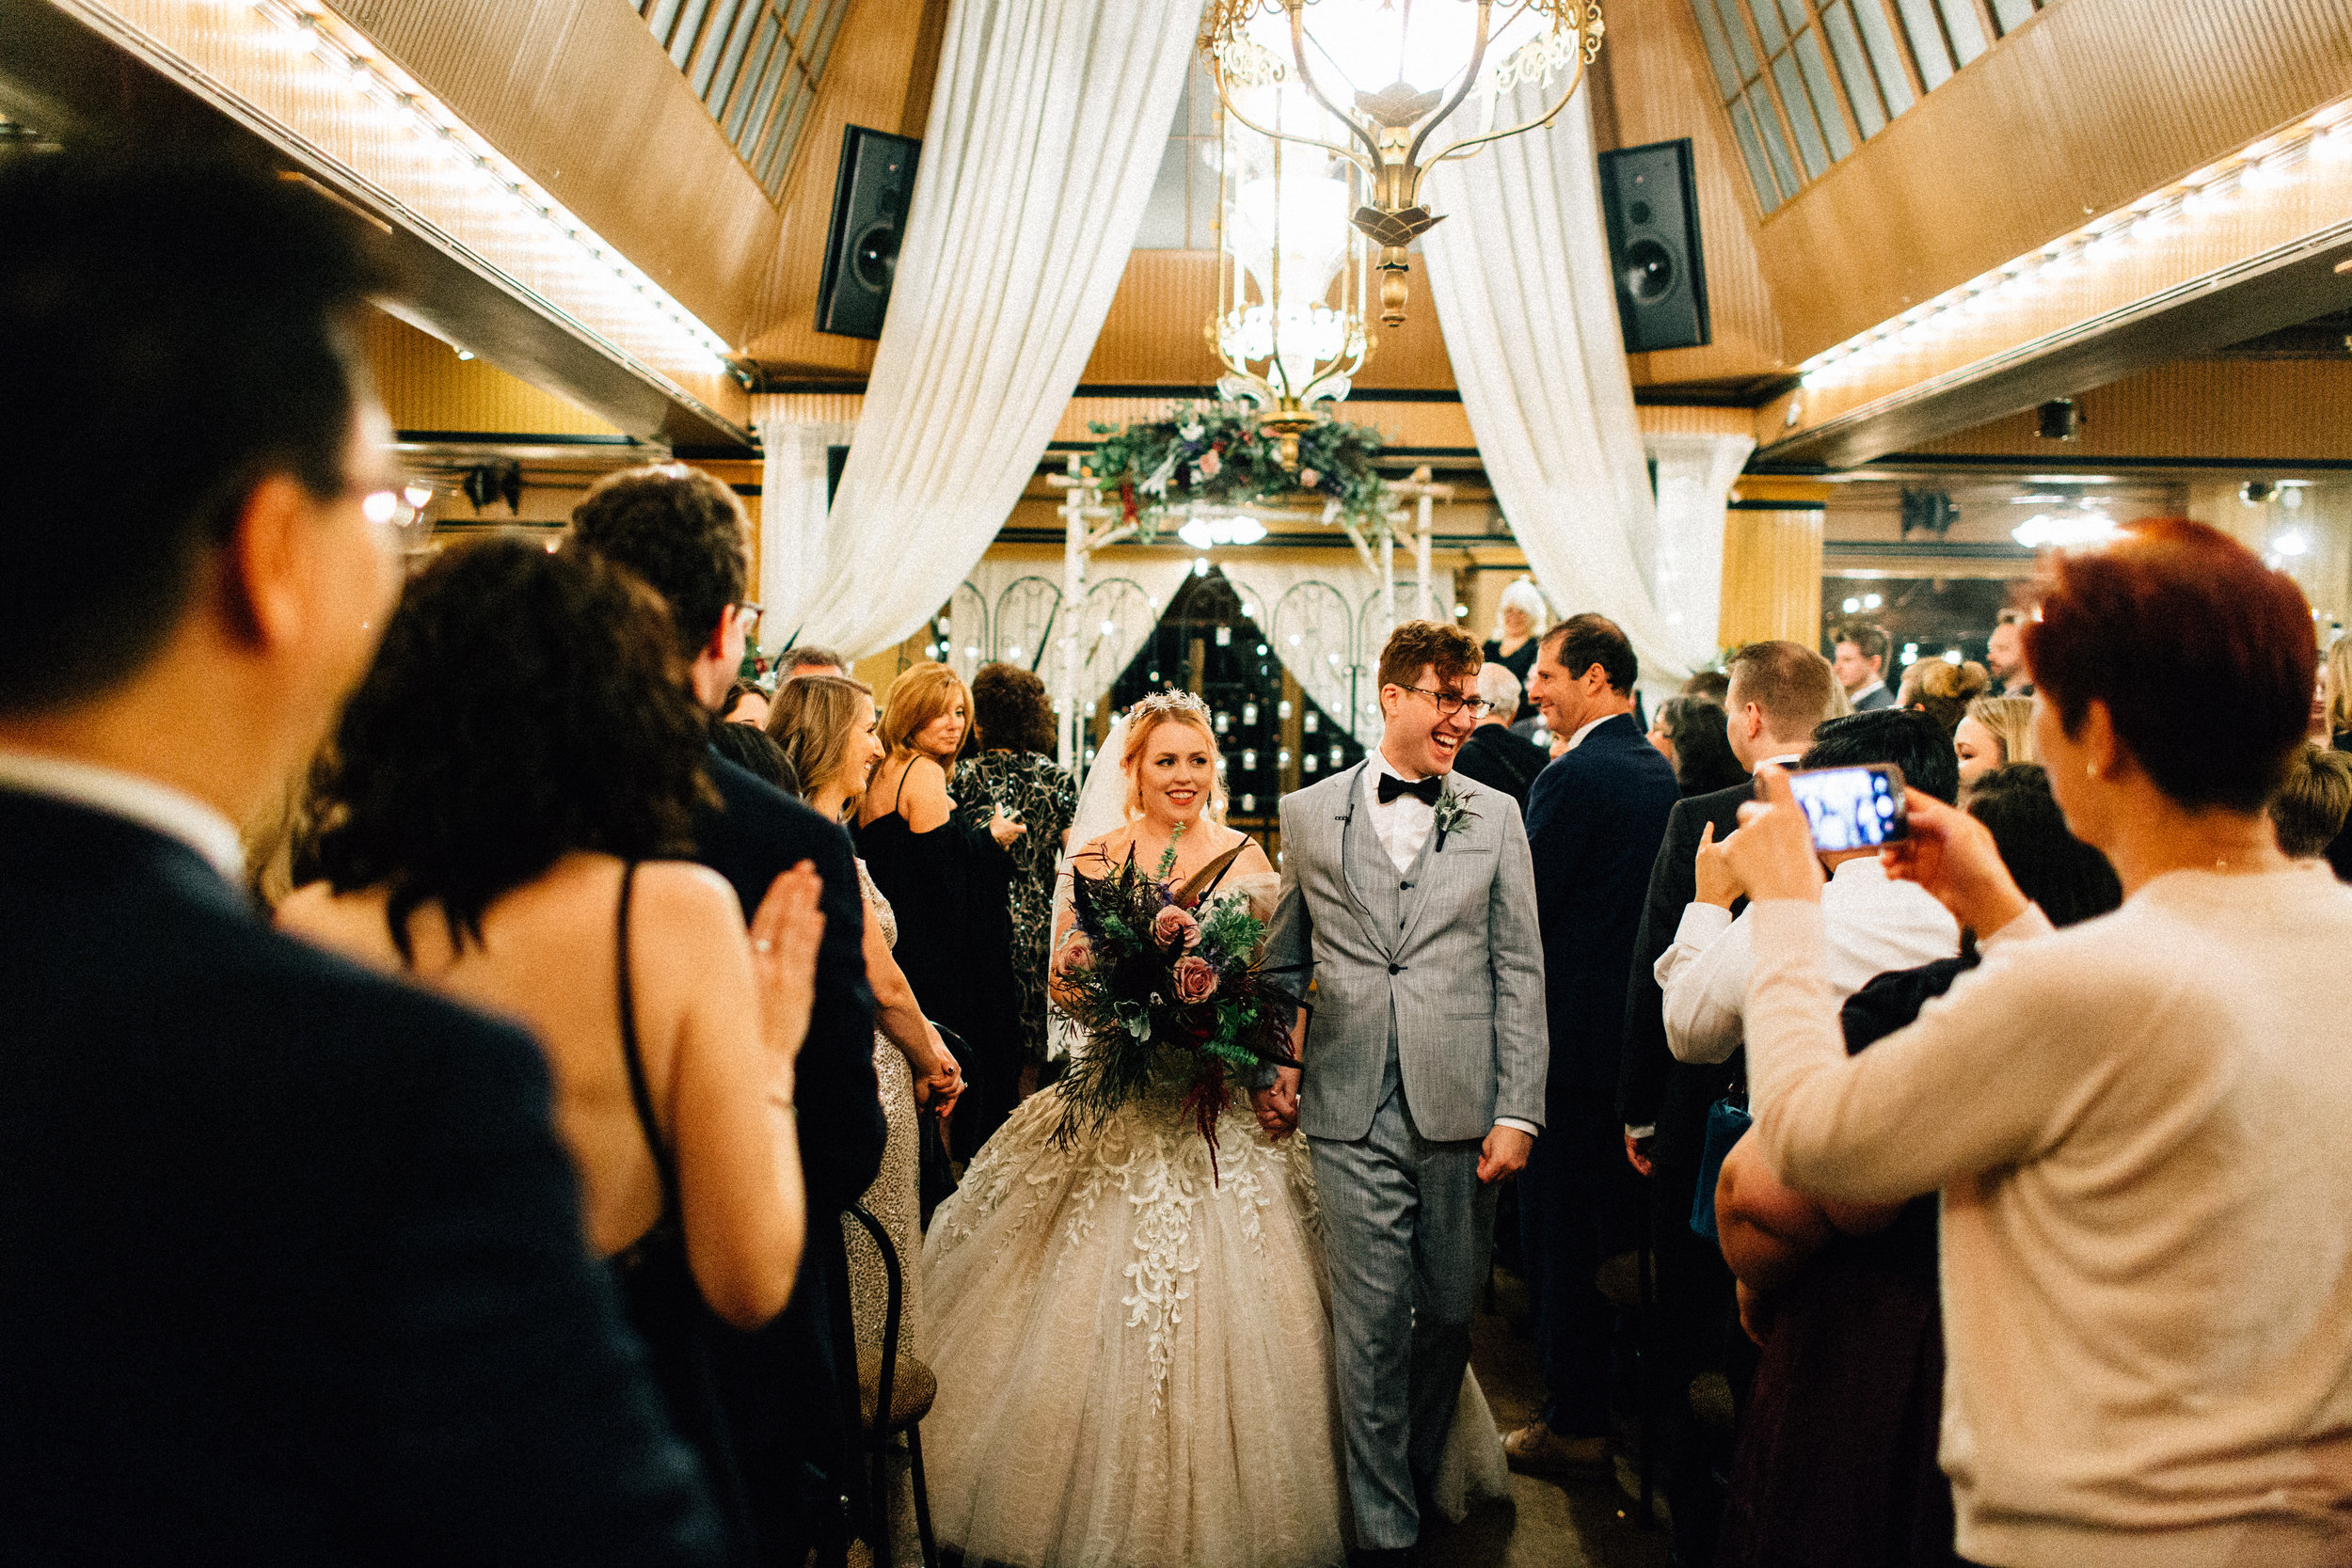 Abram-Jenn-Lake-Union-Cafe-Wedding-7741.jpg